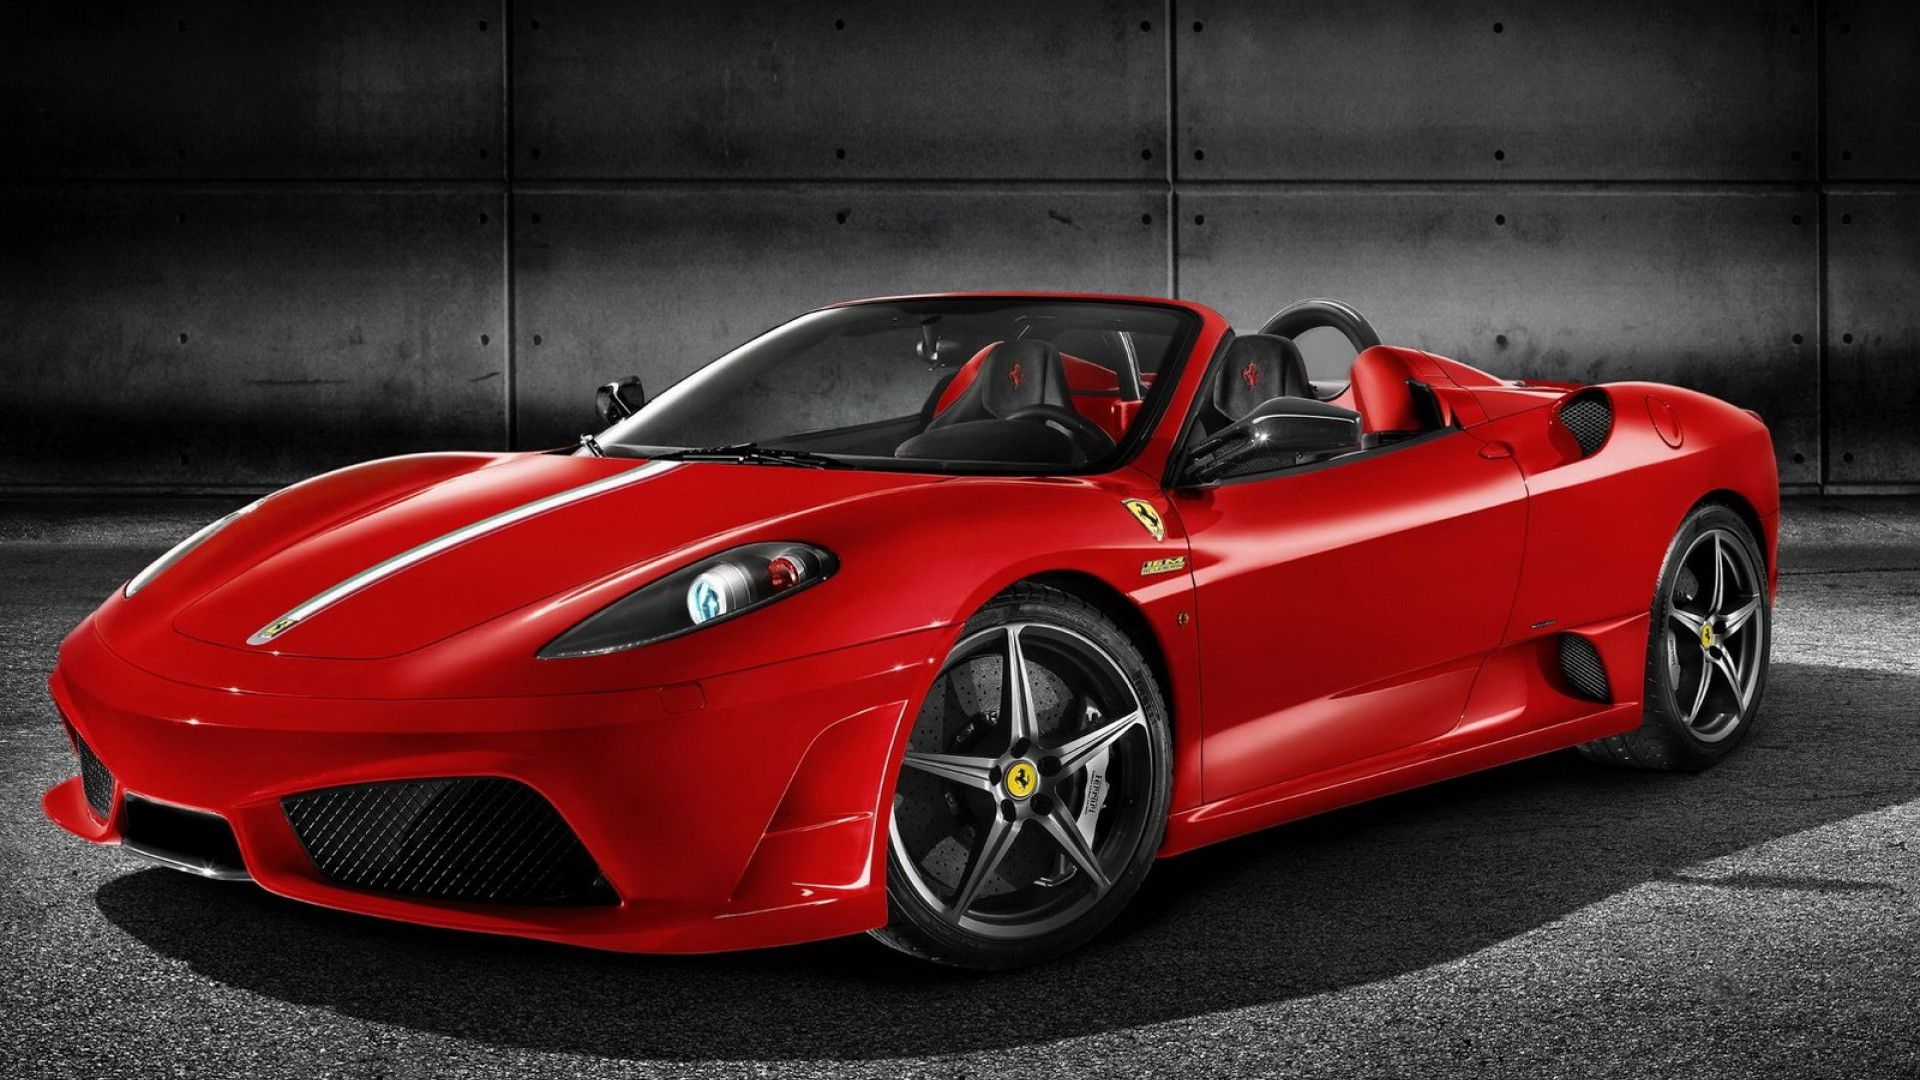 Ferrari F430 & F430 Spider